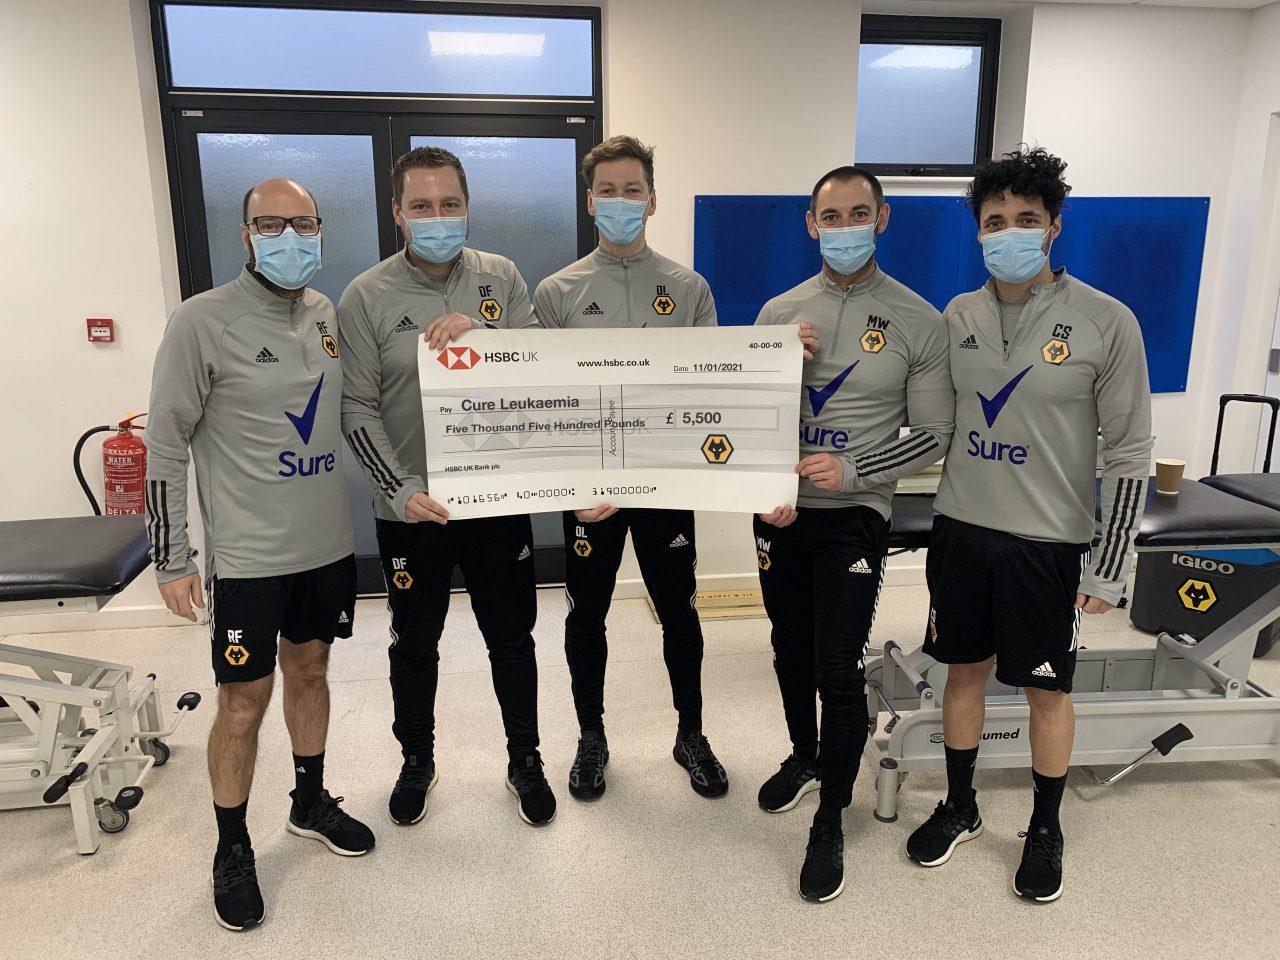 Wolves Medical Team help raise over £5,500 for Cure Leukaemia